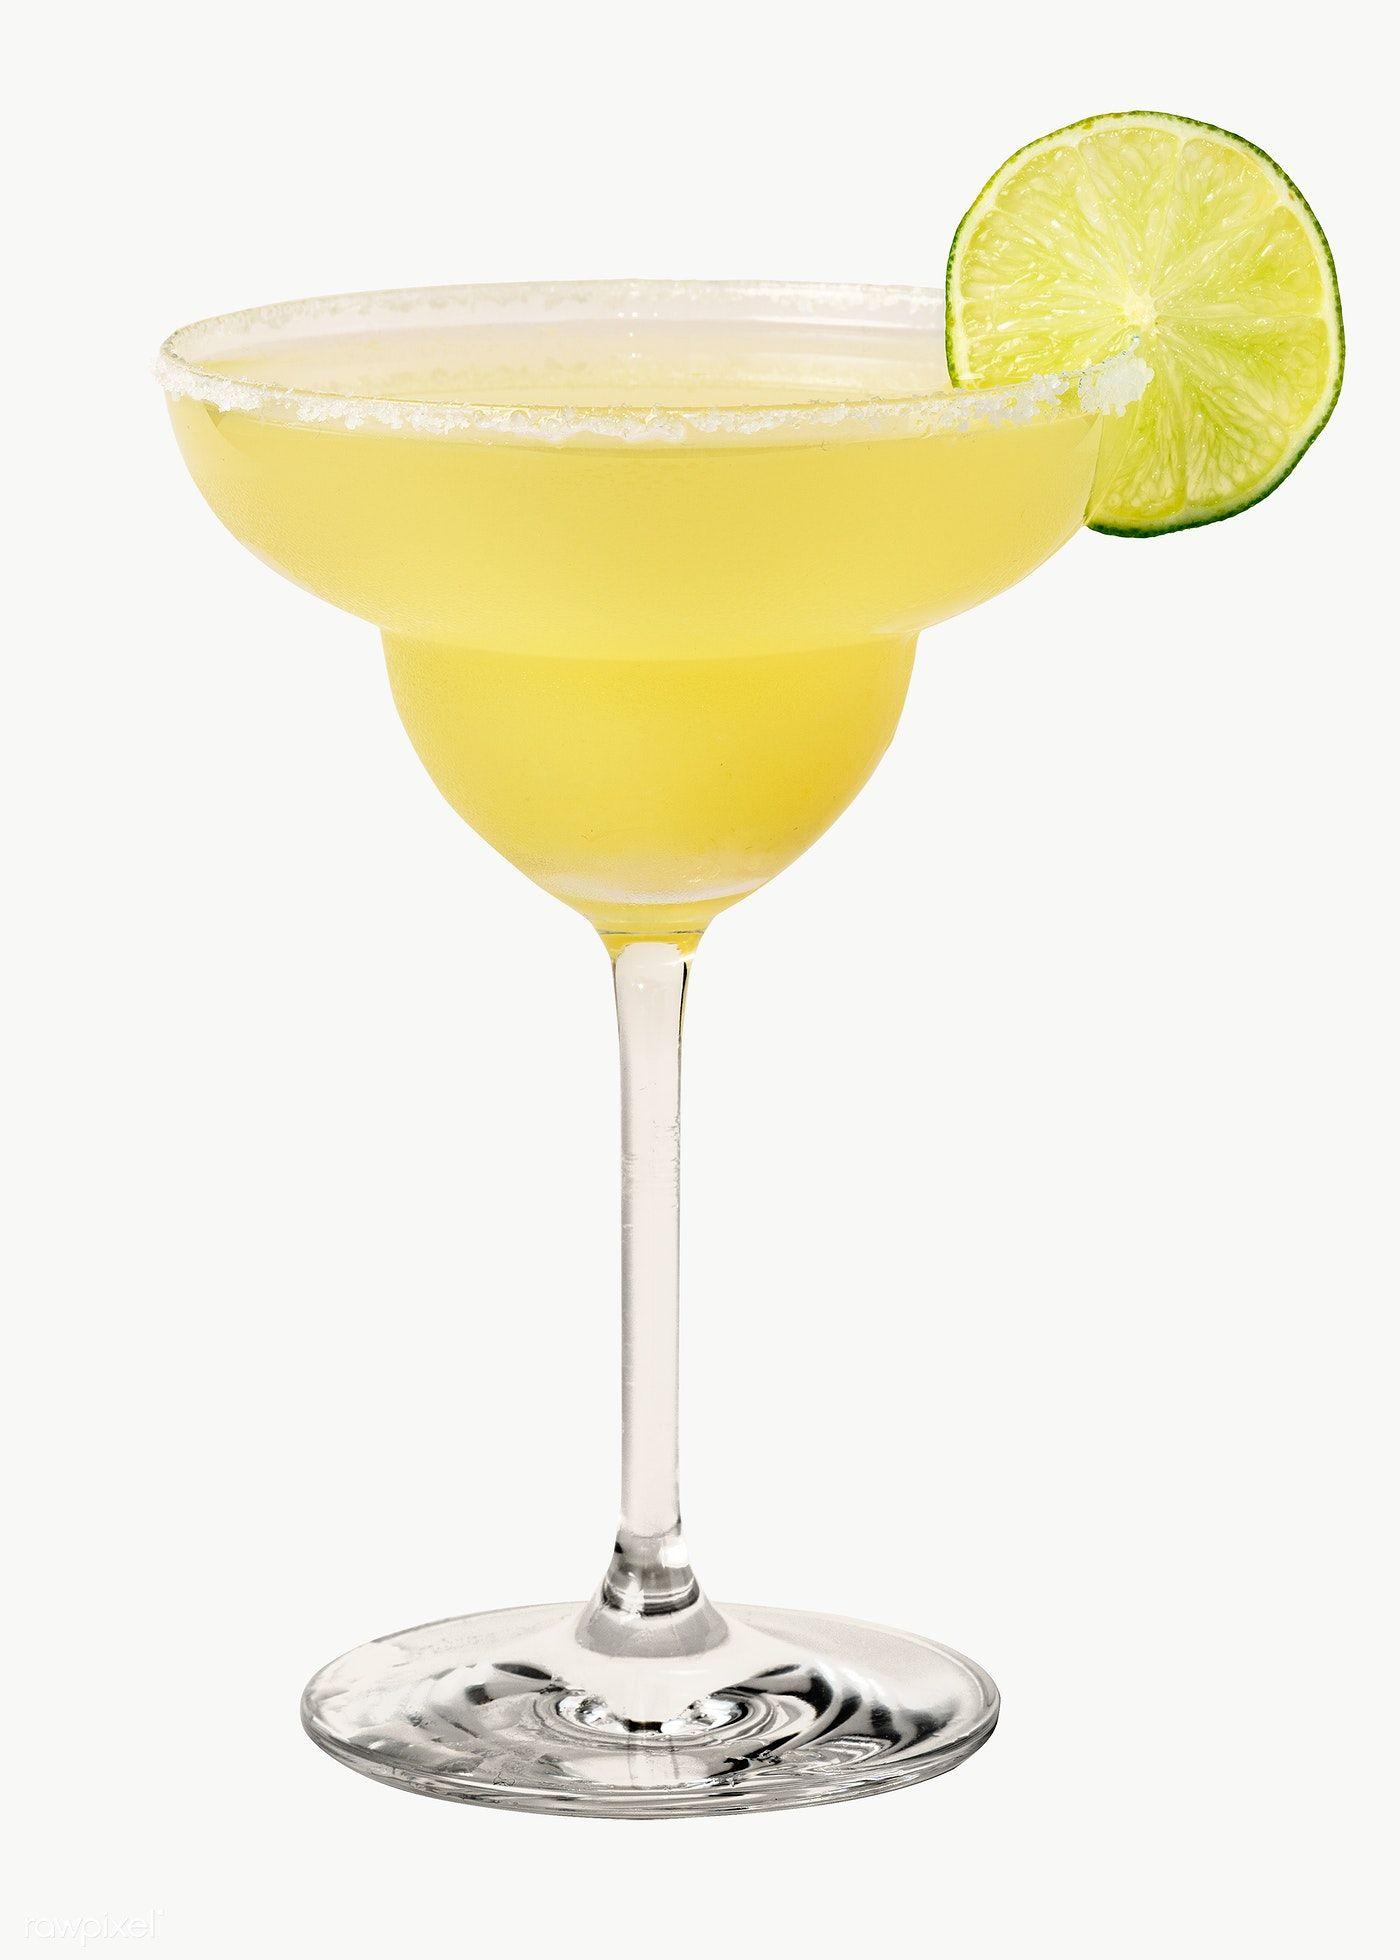 Lemon Margarita Cocktail Drink Transparent Png Premium Image By Rawpixel Com Teddy Rawpixel Lemon Margarita Margarita Cocktail Cocktail Drinks